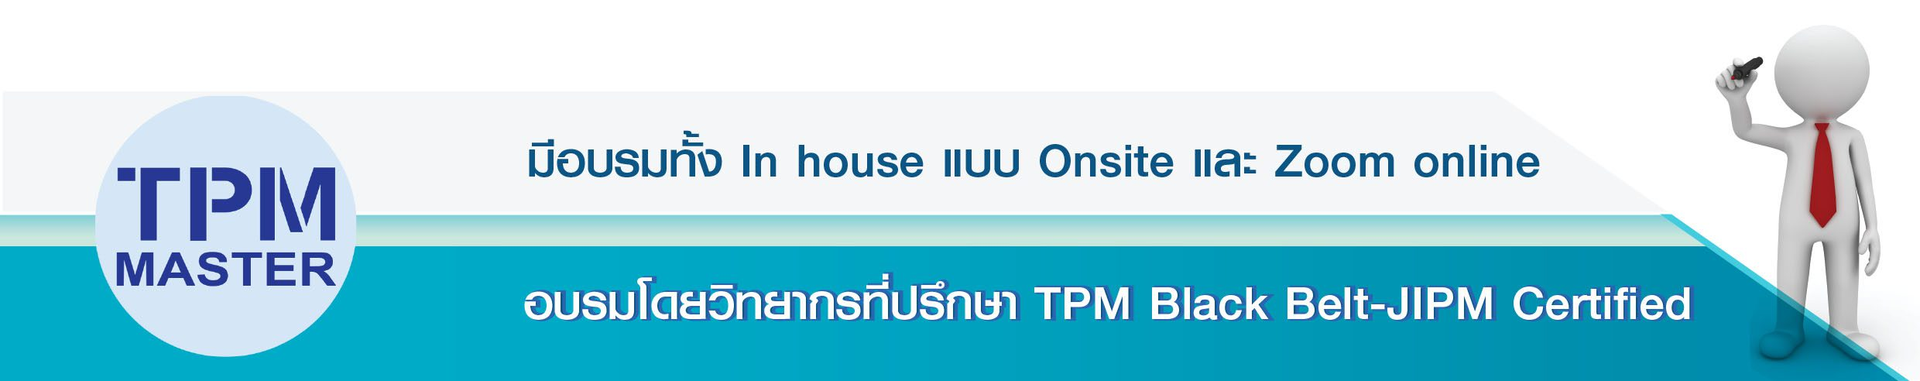 Focused Improvement (FI) in house